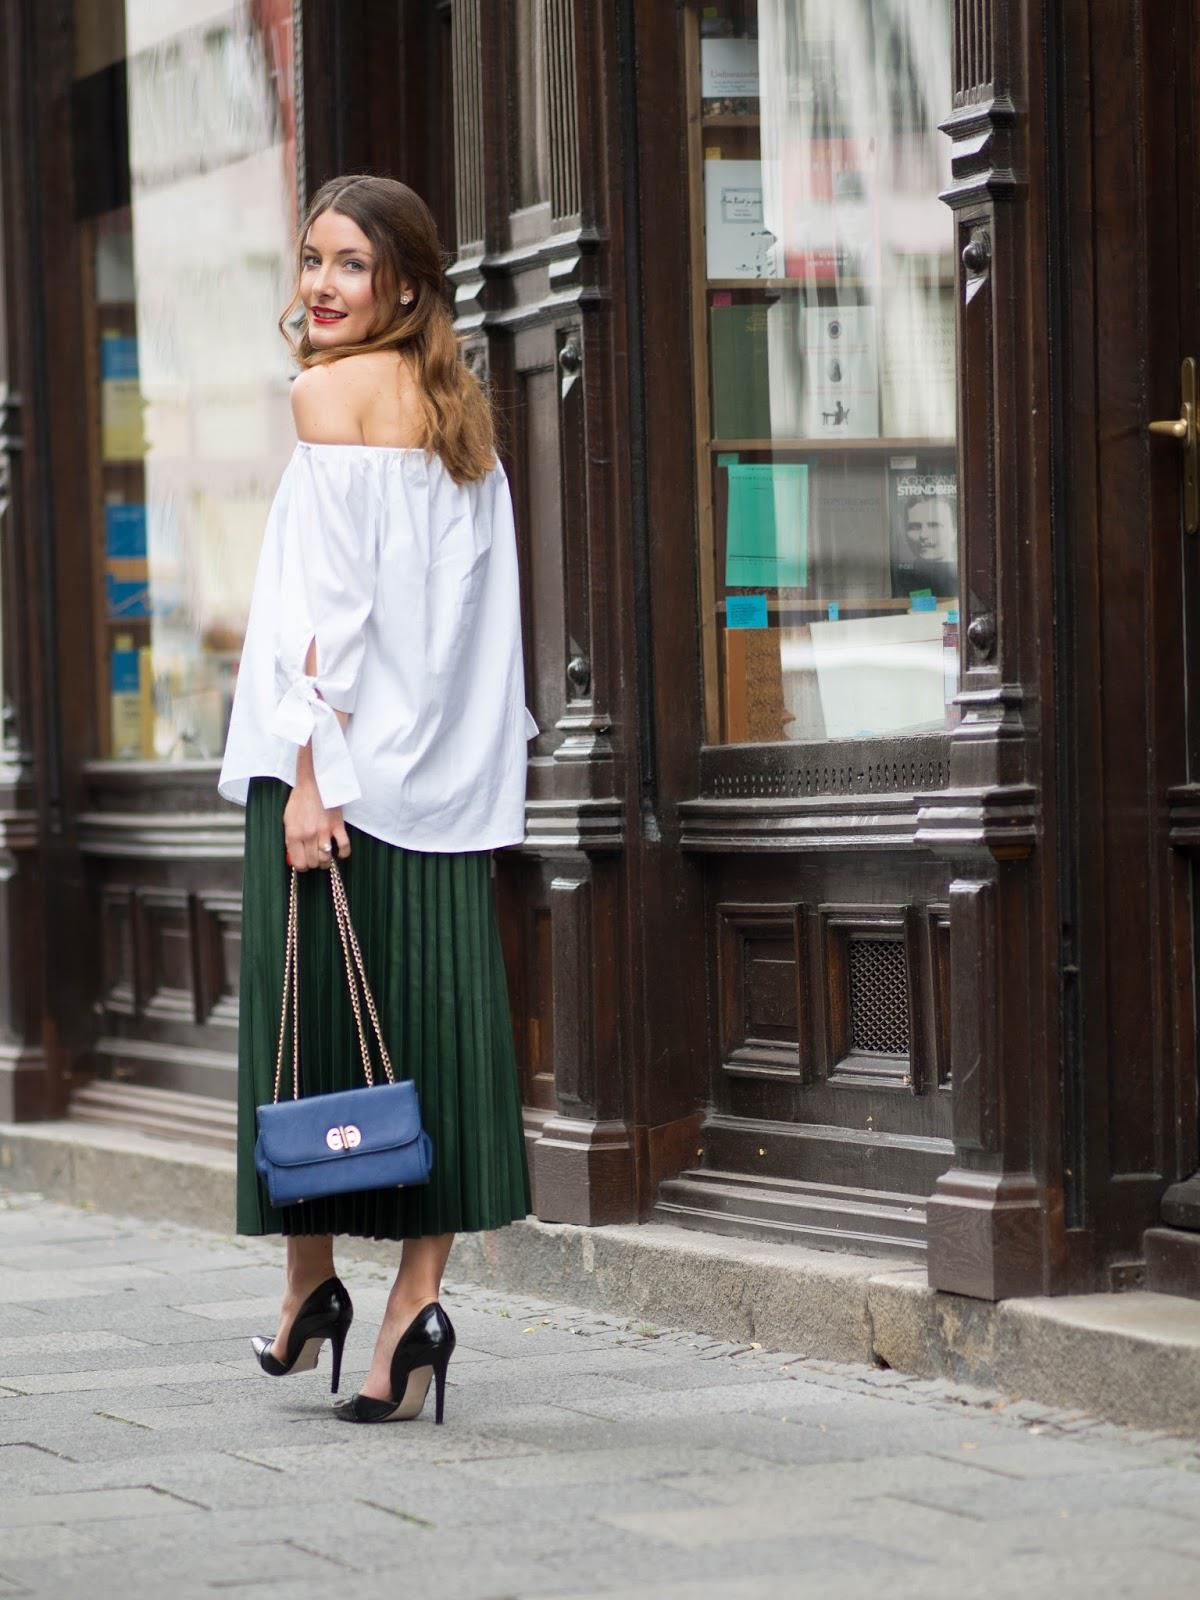 e2609bd5c3d15 green-plisses-skirt-zara-white-off-shoulder-blouse-zara-black-pointed-pumps- zara-blue-bag-golden-details-orsay